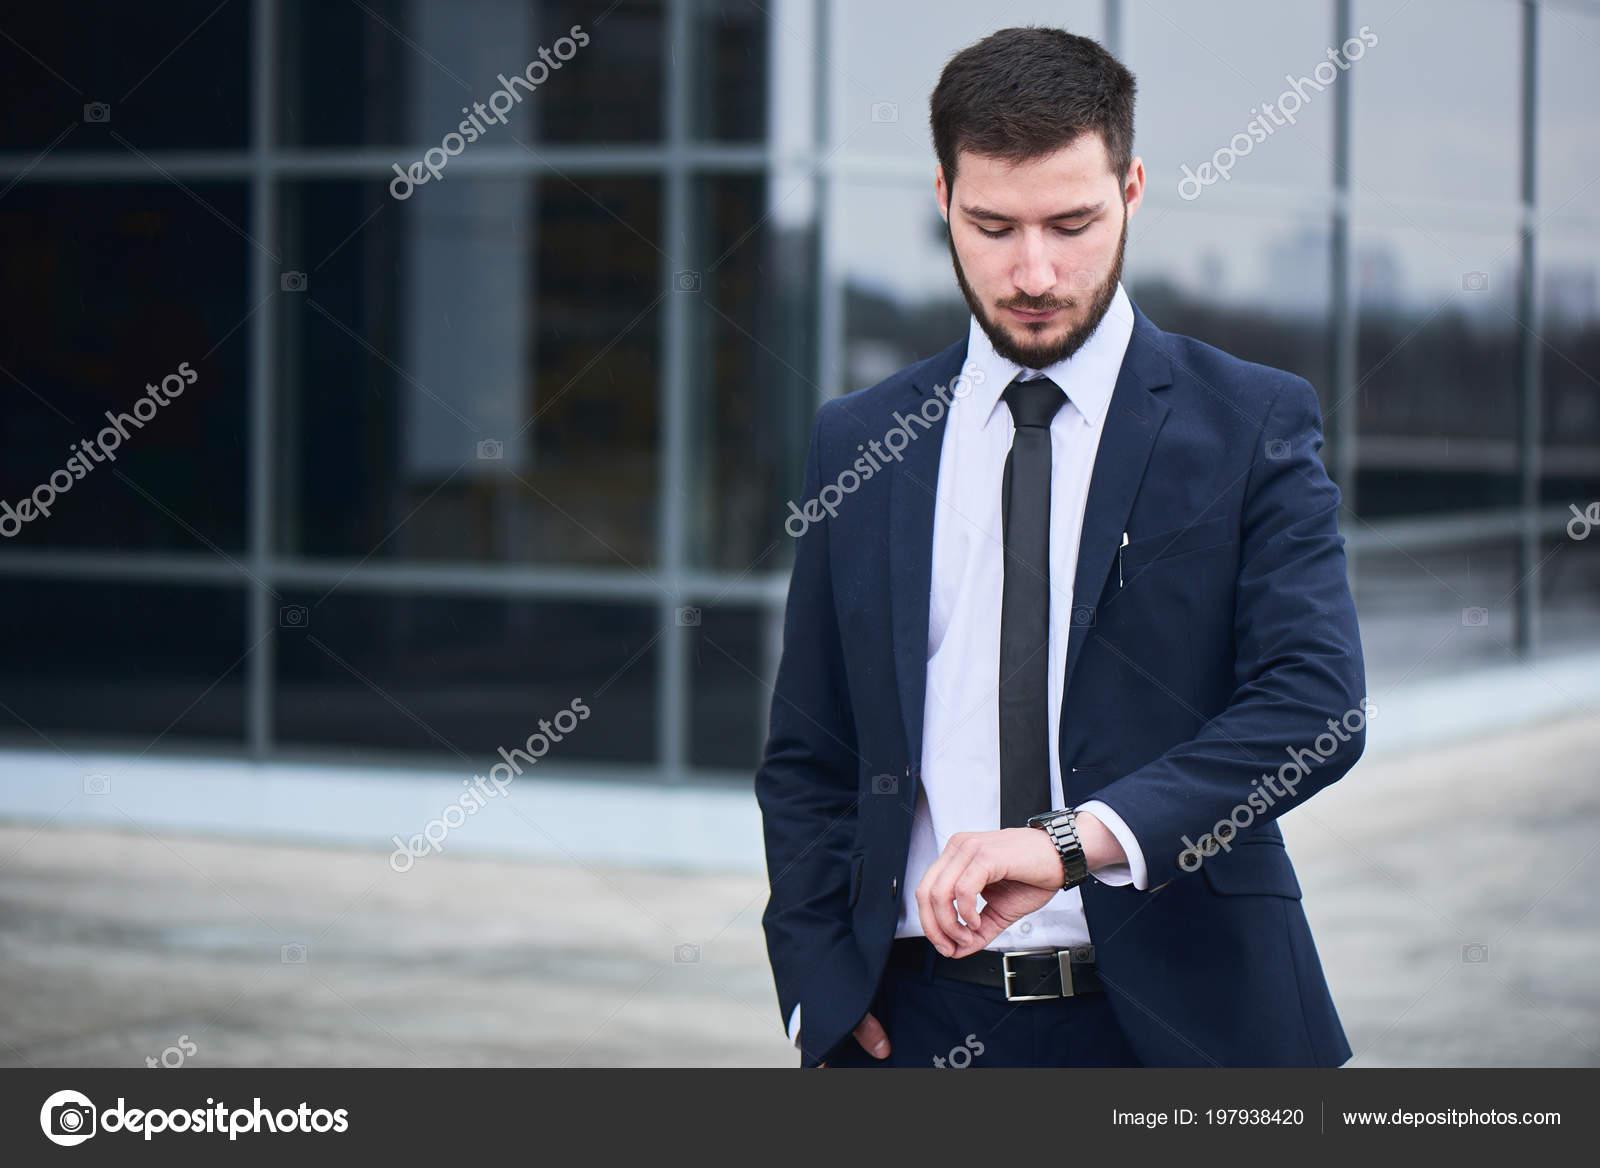 88db83b0b921 Όμορφος γενειοφόρος επιχειρηματία σε λευκό πουκάμισο και σακάκι βλέπουν  ρολόι από πλευρά ενώ στέκεται στο δρόμο — Εικόνα από ...